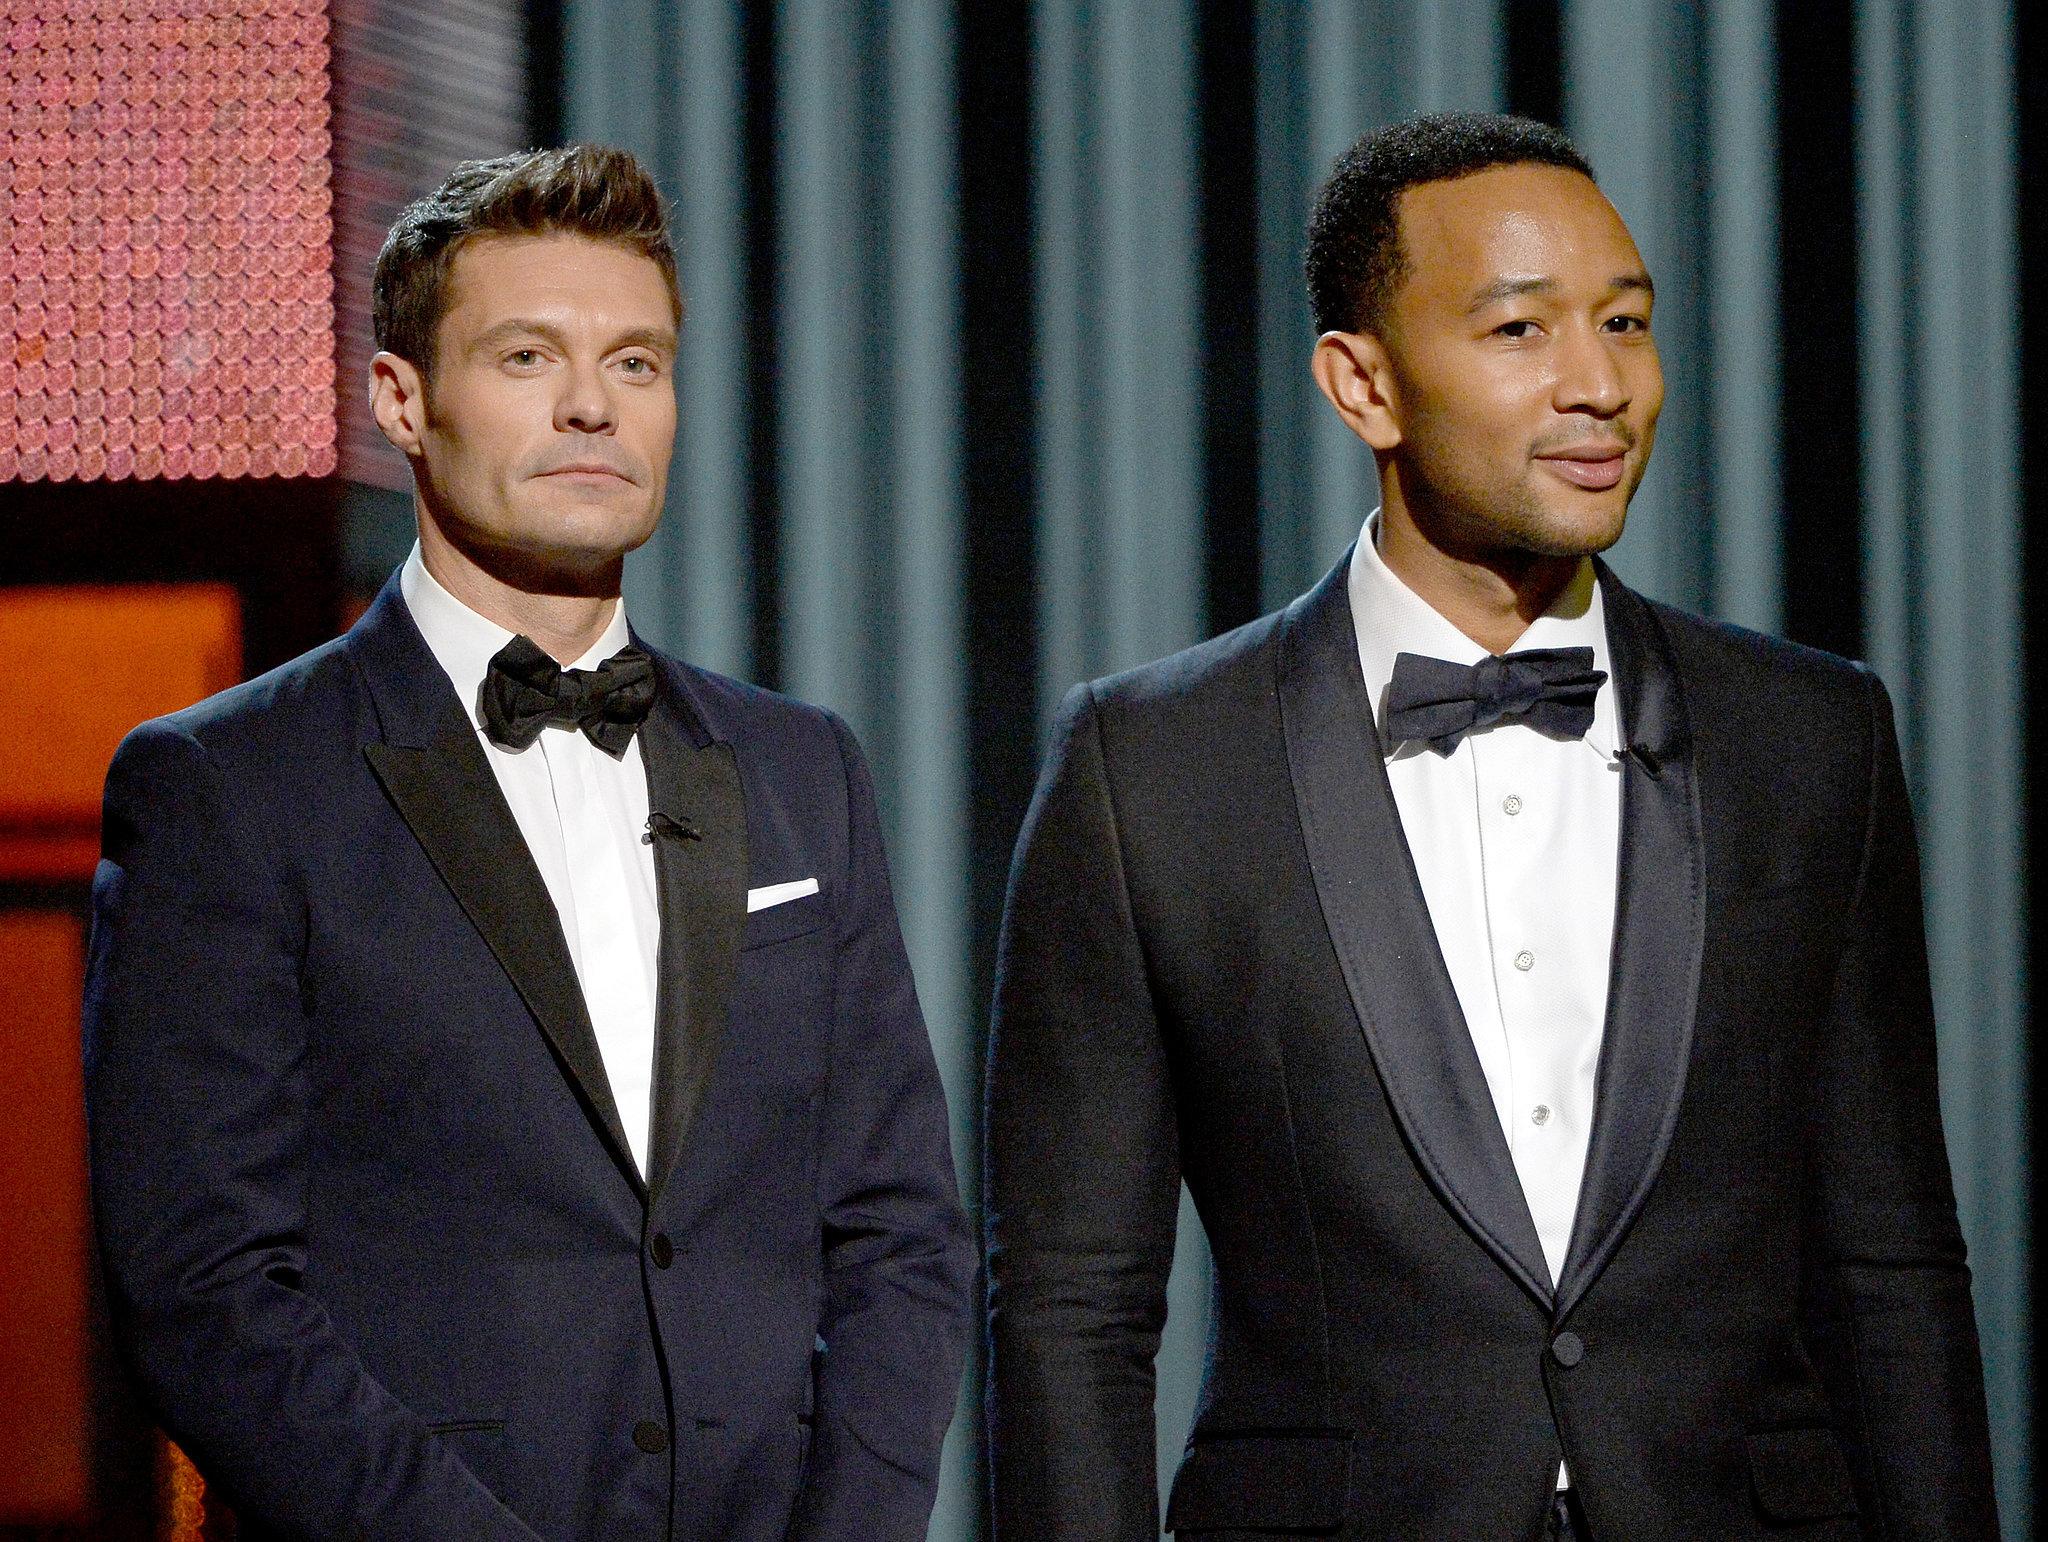 Ryan Seacrest and John Legend looked dapper.